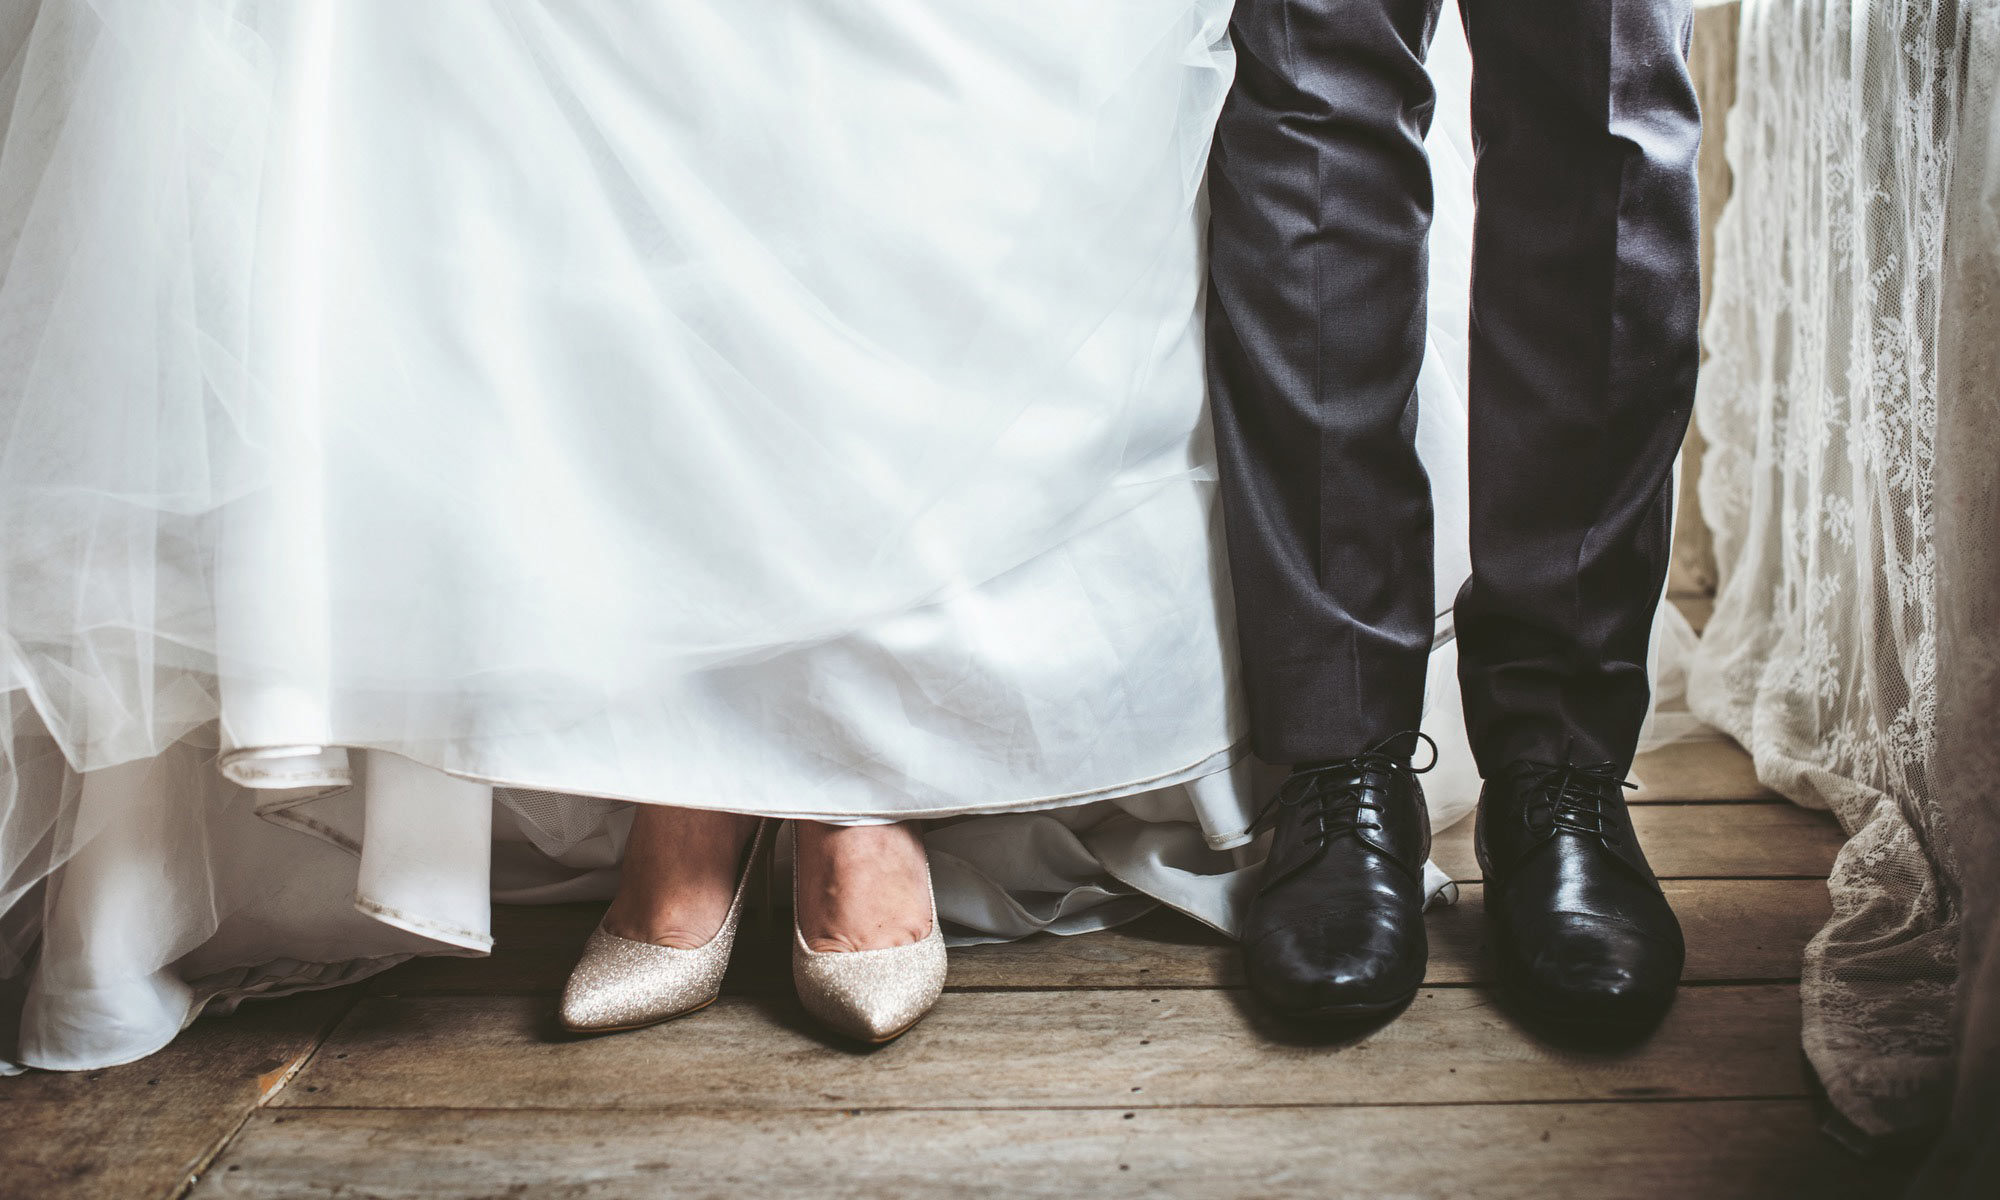 Bryllupsunivers - Alt om bryllup